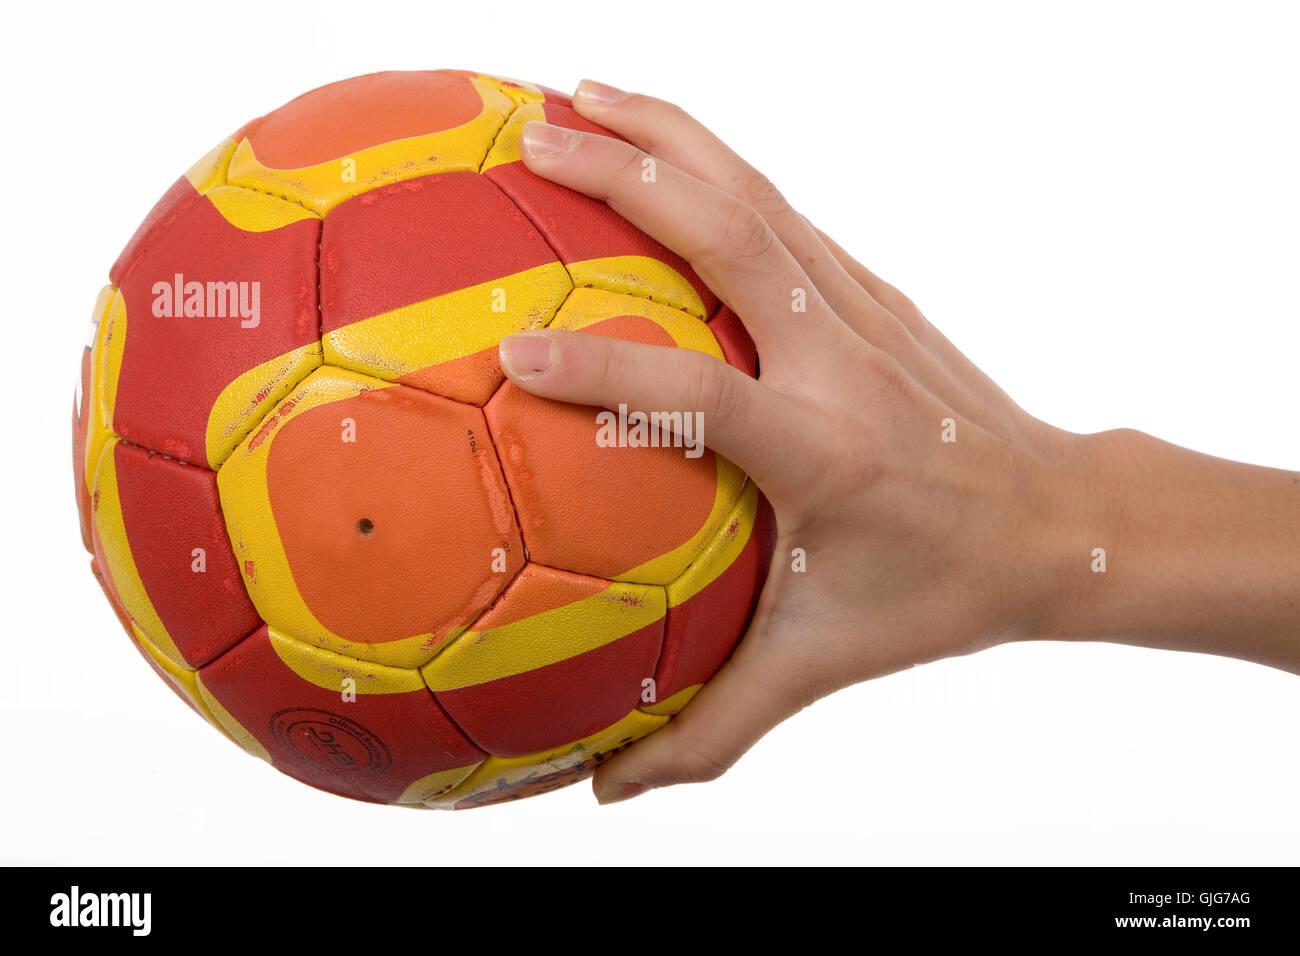 handball - Stock Image